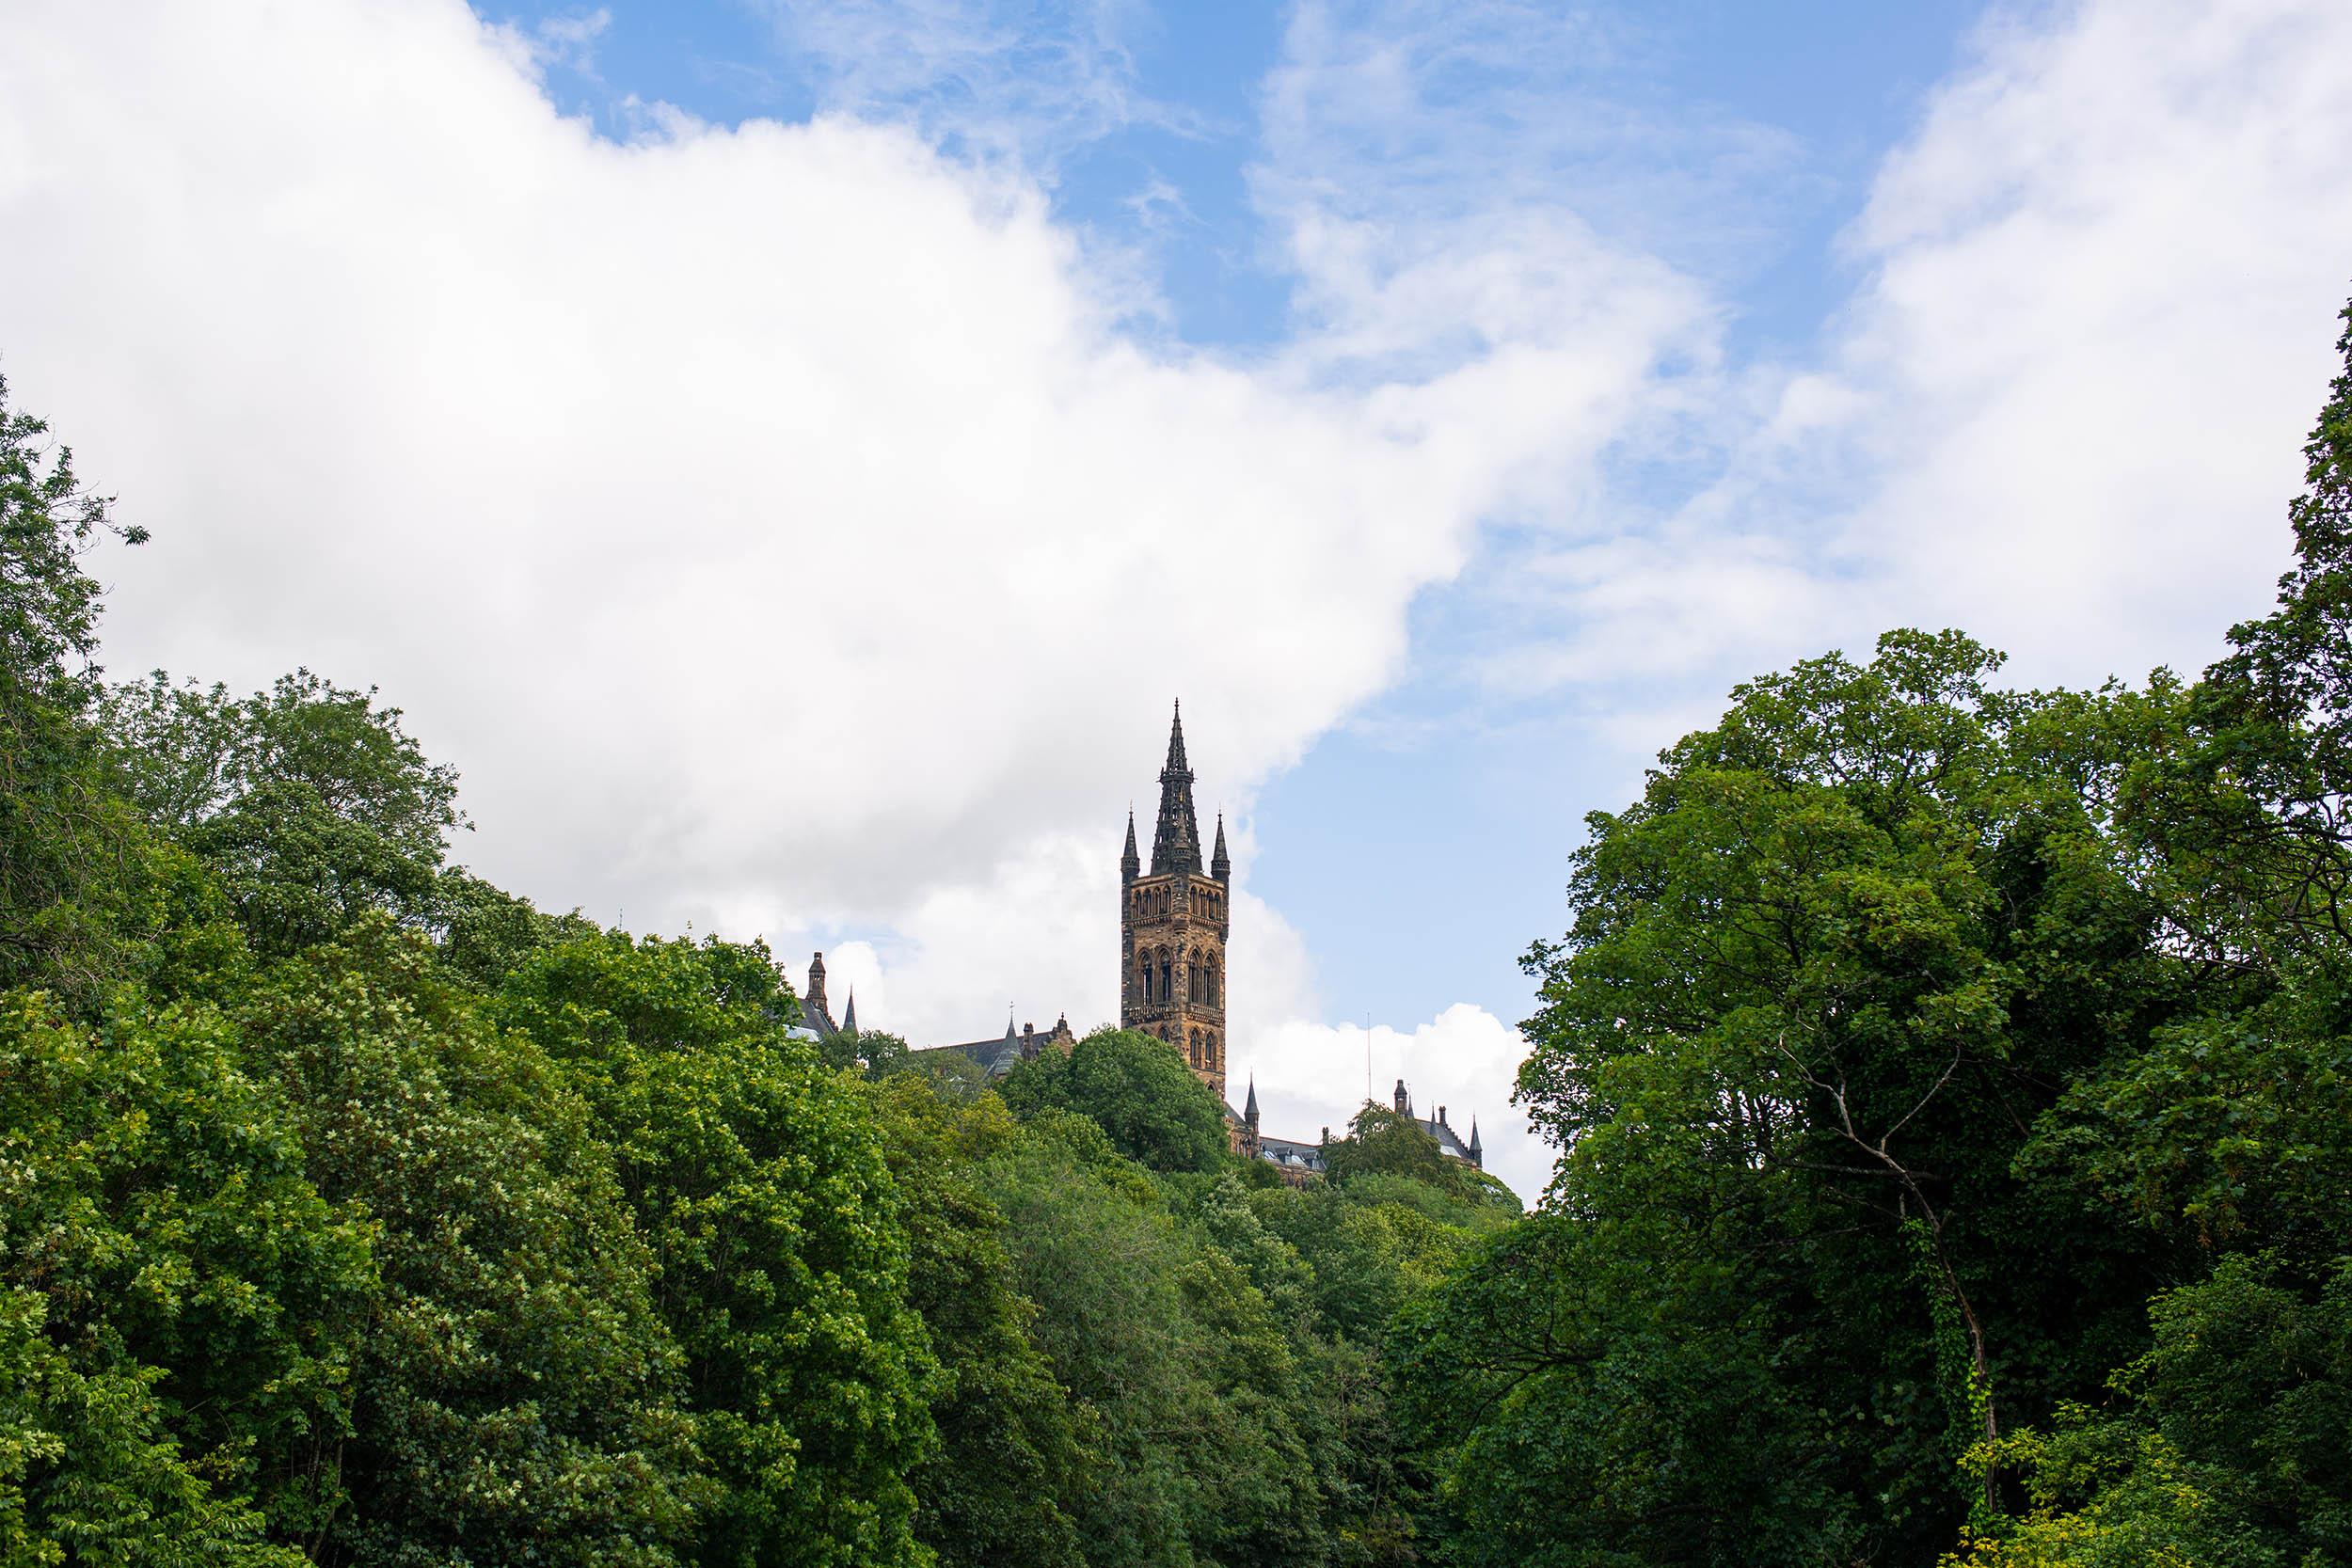 SCOTLAND_GLASGOW_GLASGOWUNIVERSITY_0017